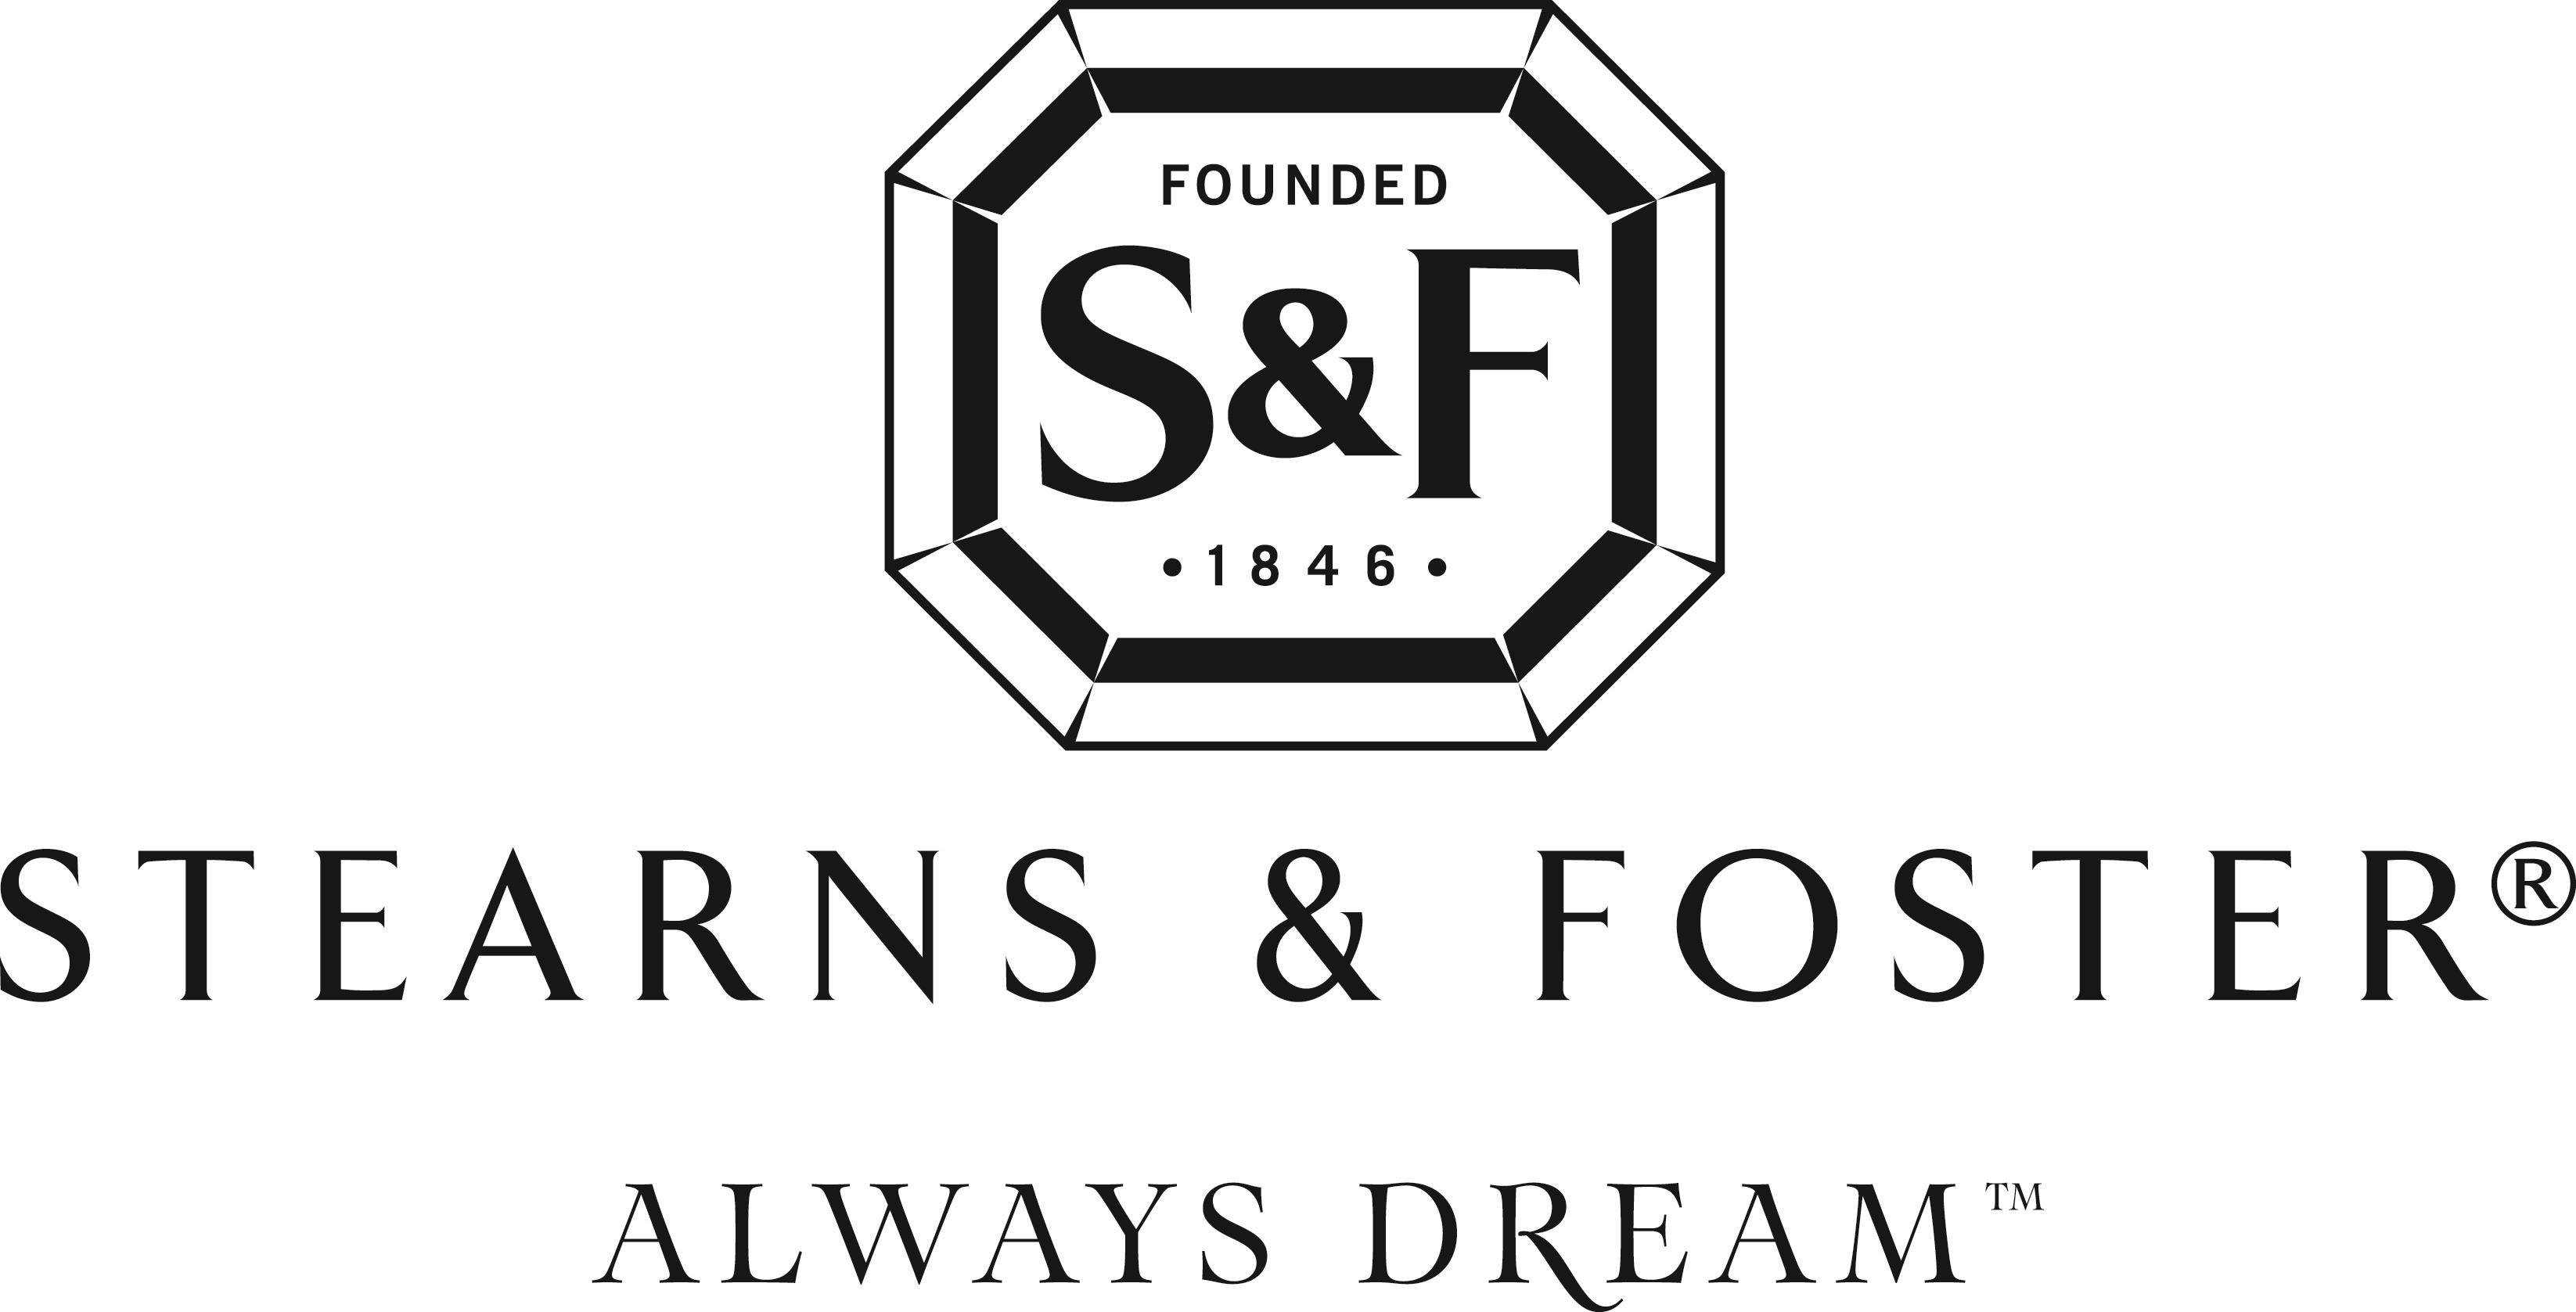 sainte rose luxury firm estate by stearns u0026 foster becker furniture world stearns u0026 foster sainte rose luxury firm dealer - Stearns And Foster Mattress